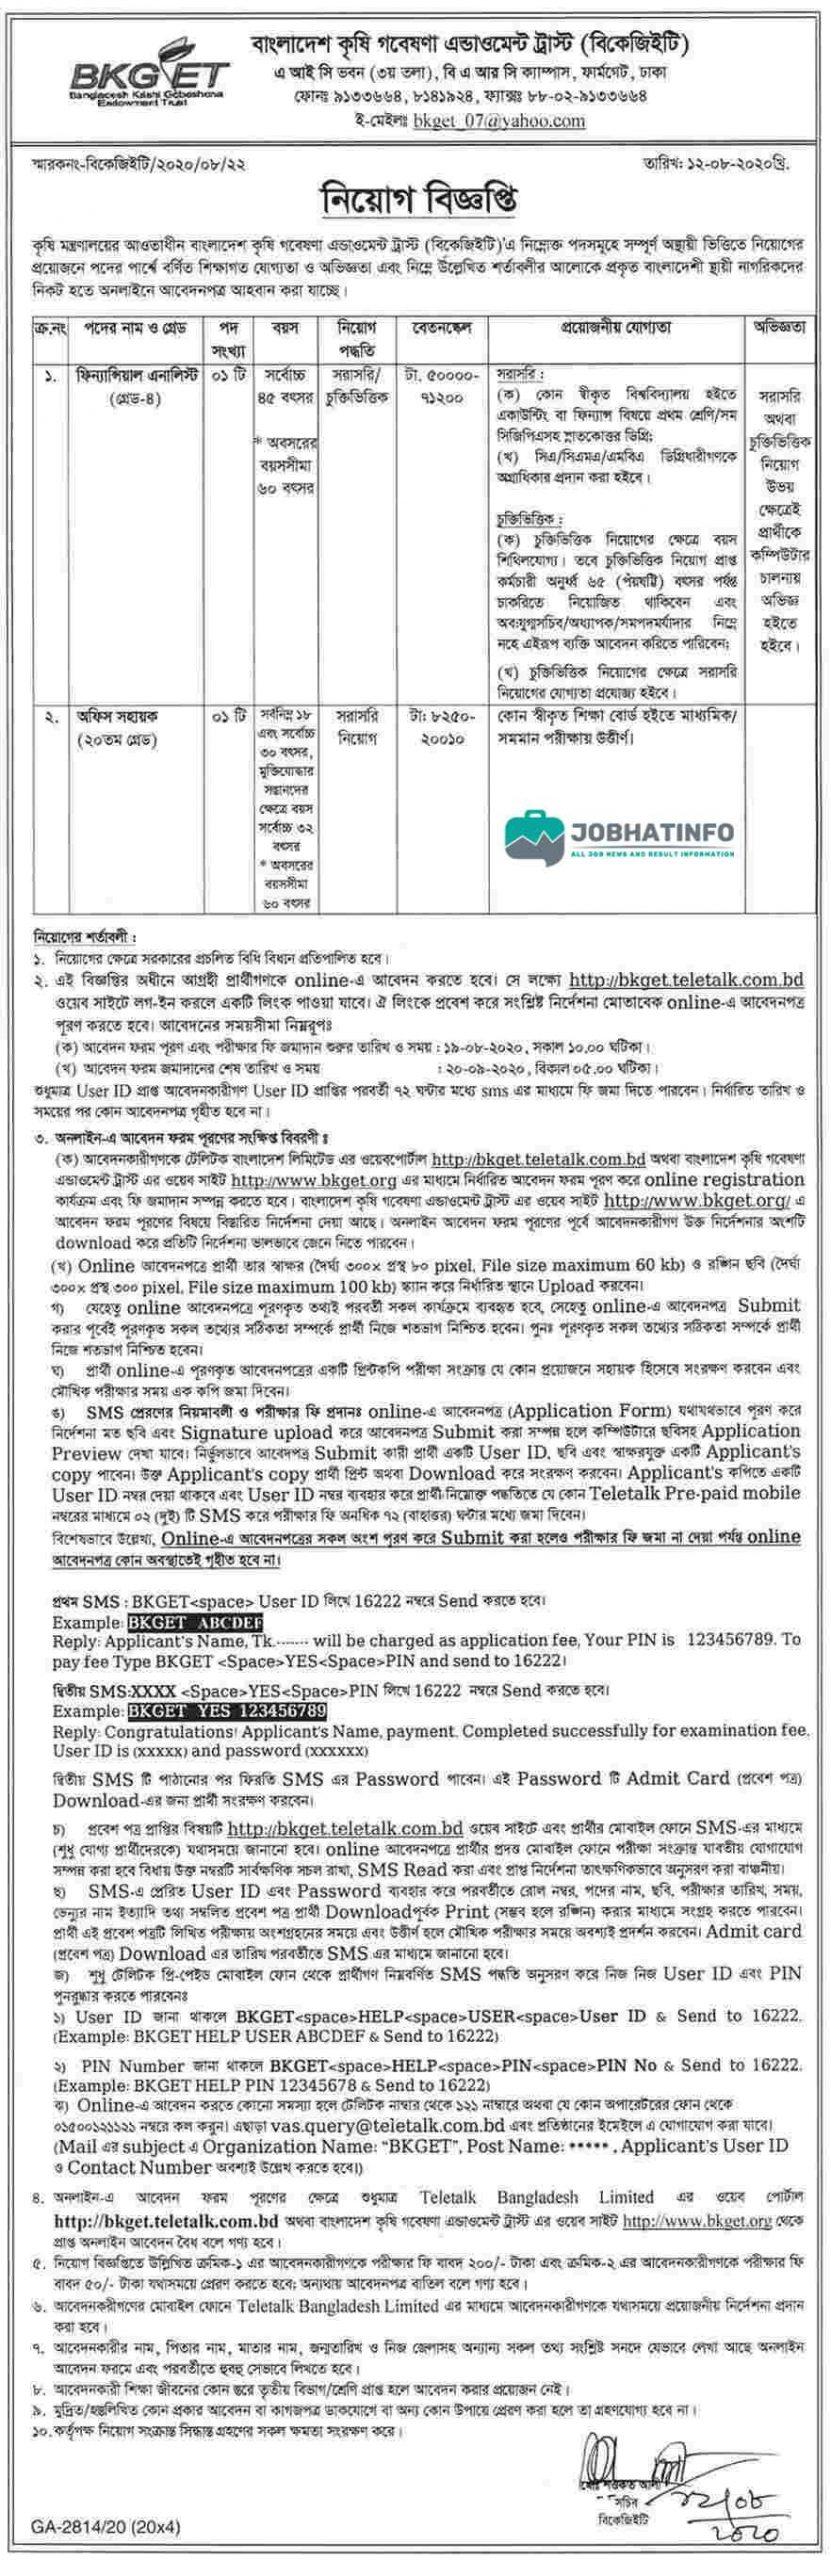 MOA Job Circular 2020  | Ministry of Agriculture | Govt Job Circular 1